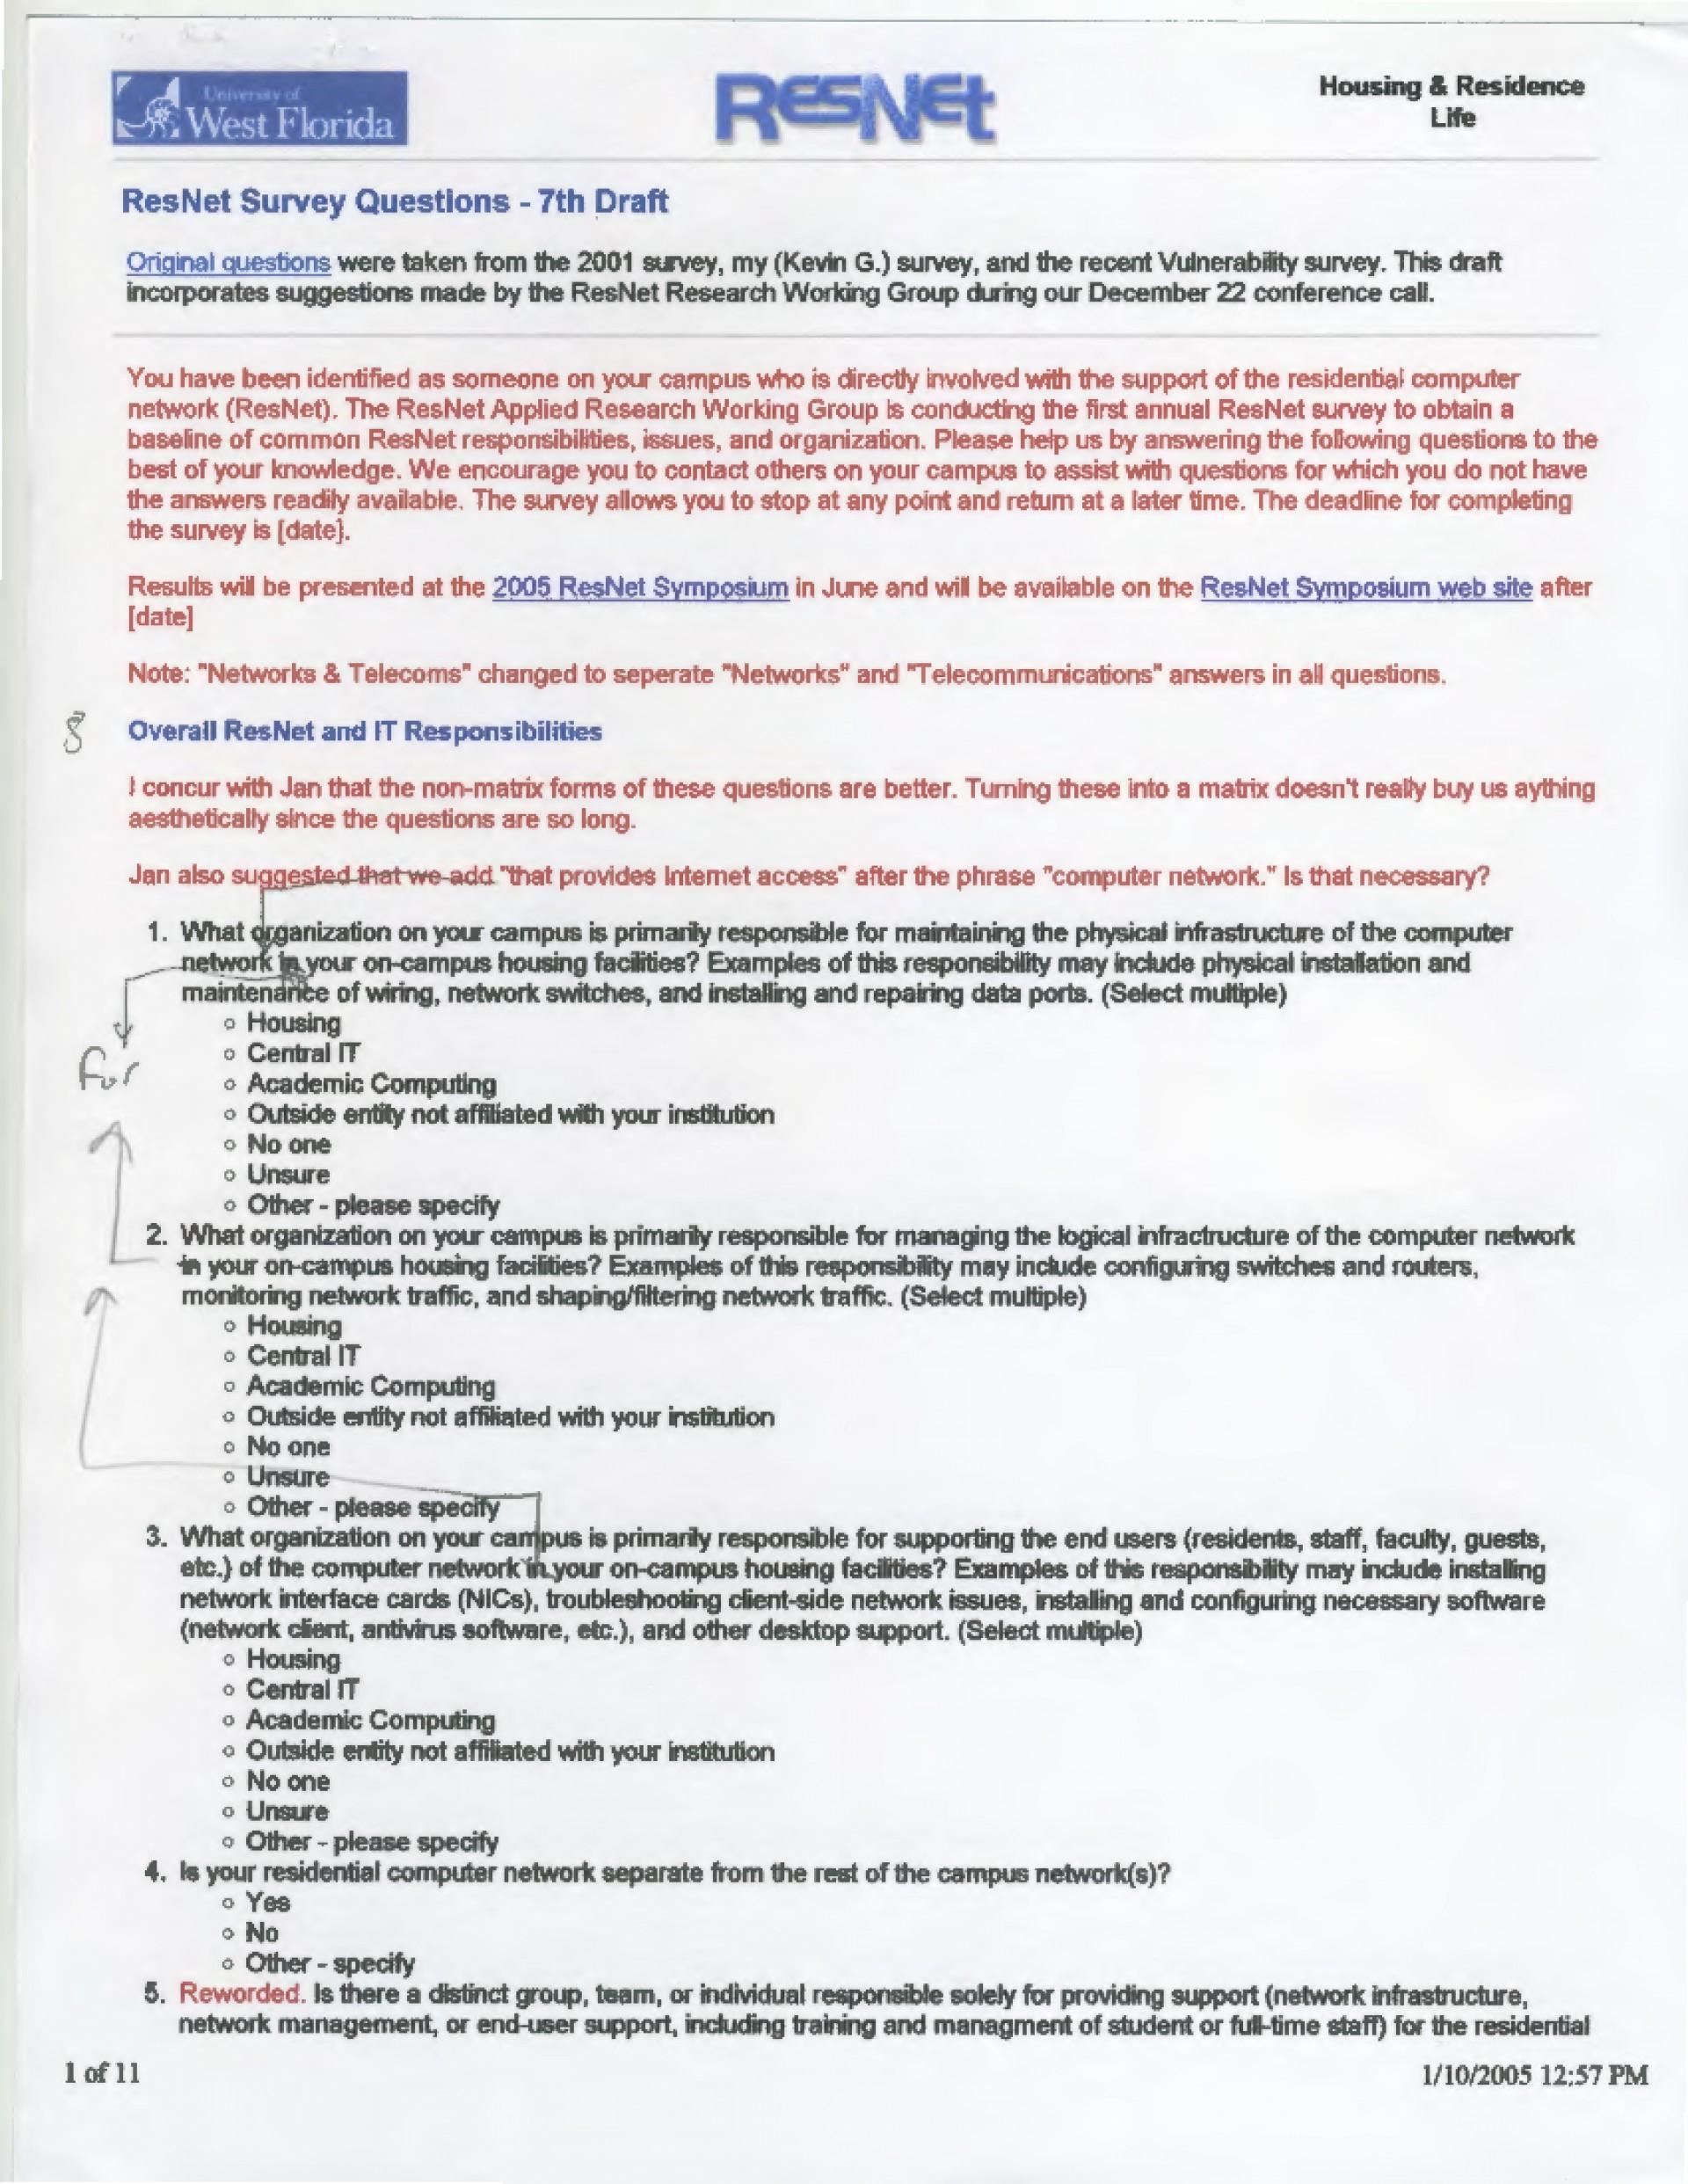 008 Essay Example Checker Free Online Originality Check Turnitin Macquarie College Resnet Survey Draft Amazing Sentence Grammar Plagiarism Document 1920